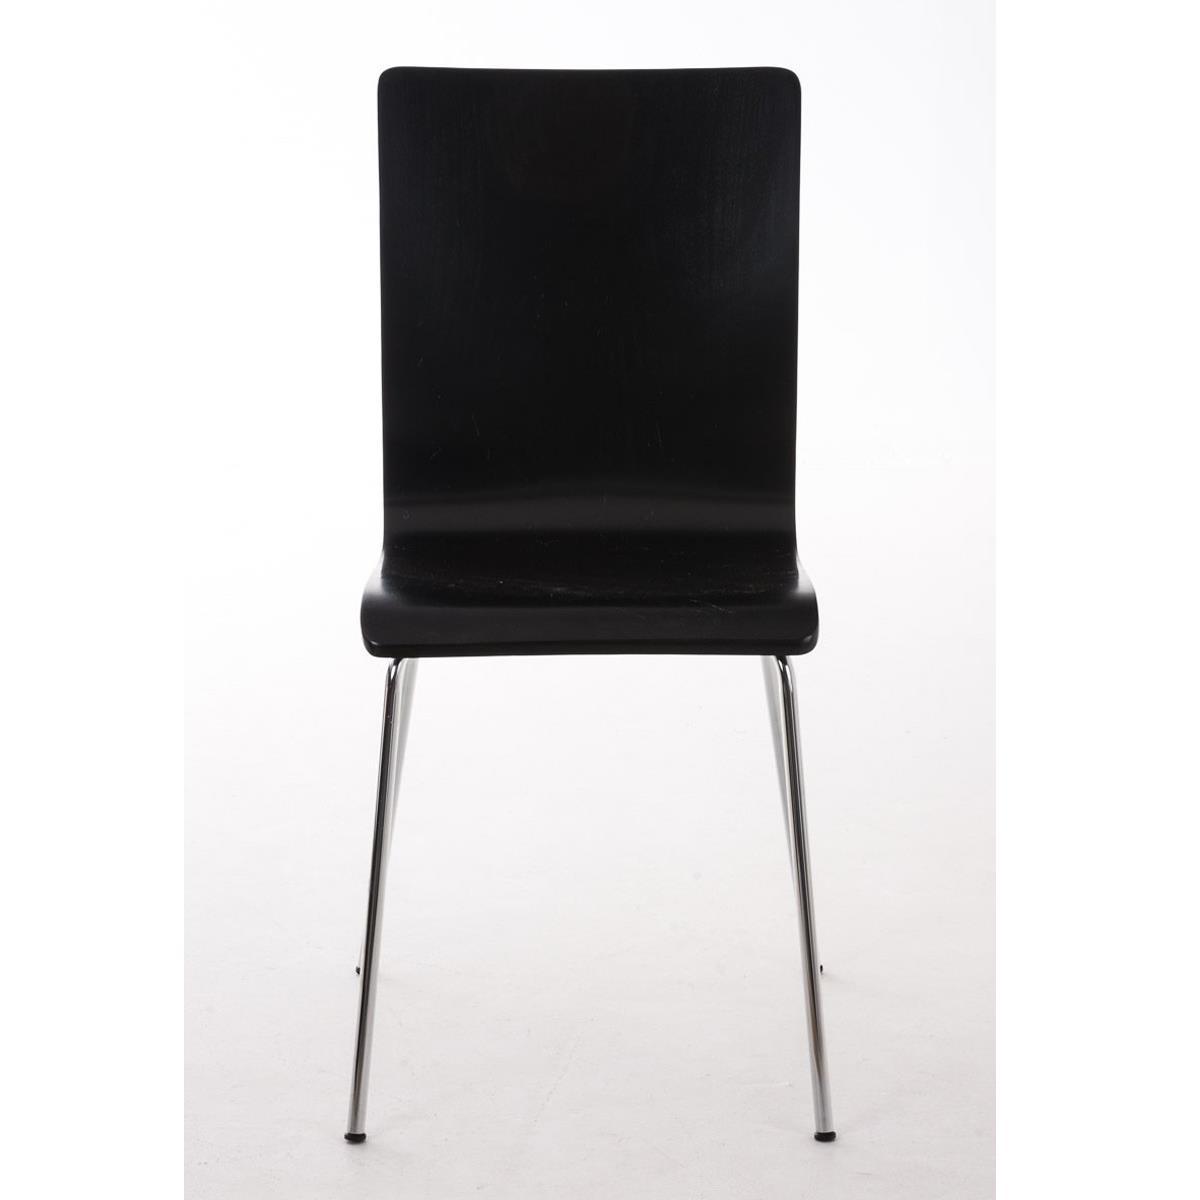 Silla de cocina o comedor lodi en color negro silla de for Sillas metalicas para cocina